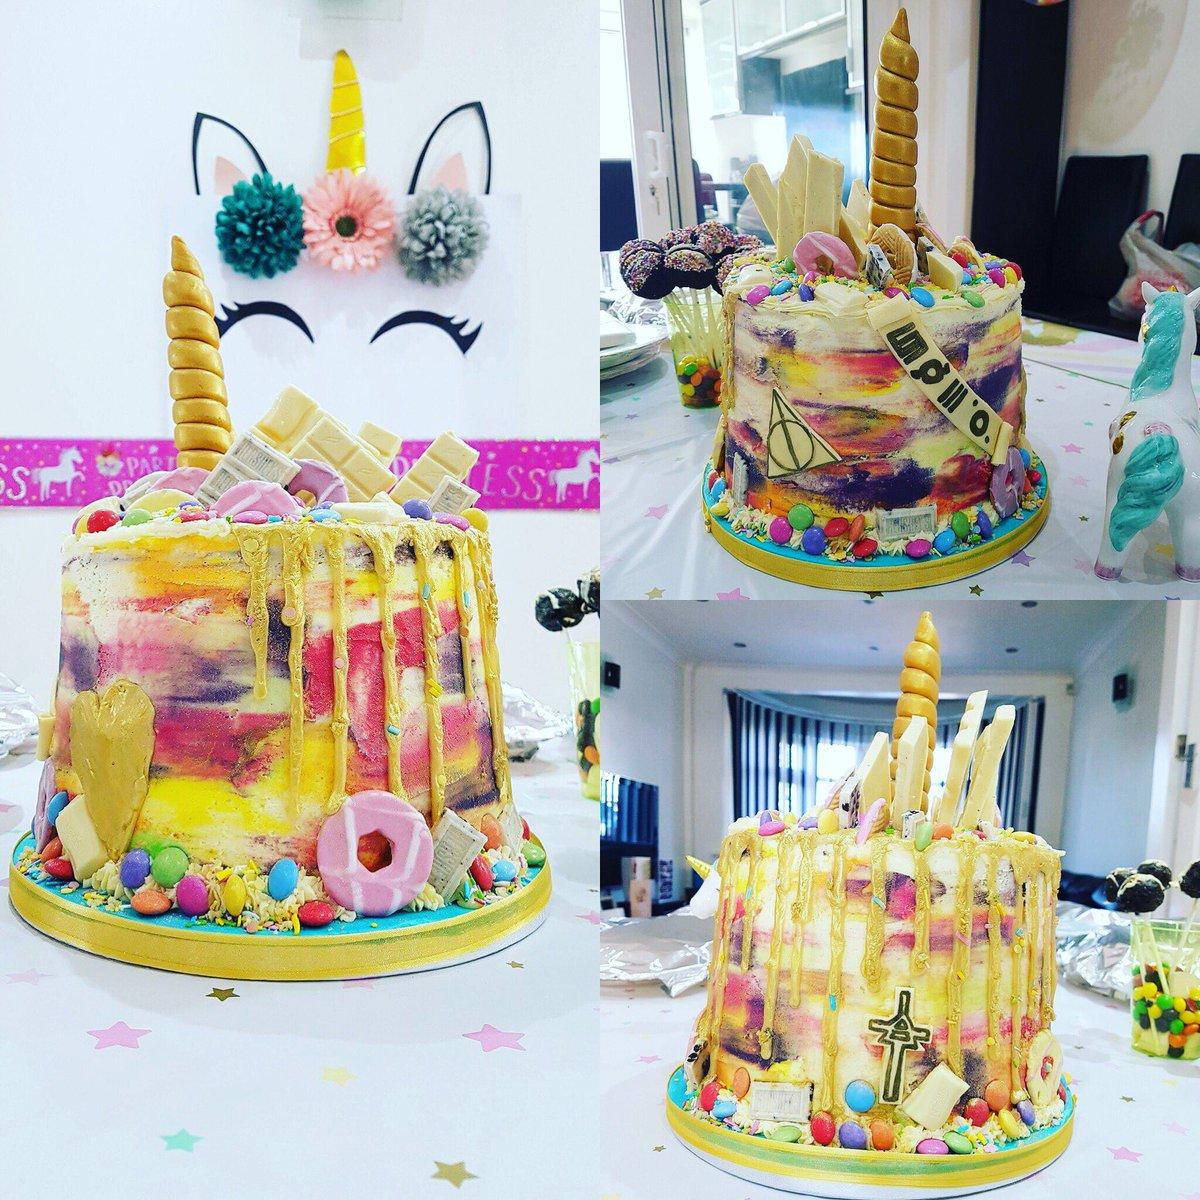 Shree On Twitter My 30SECONDSTOMARS Unicorn Birthday Cake